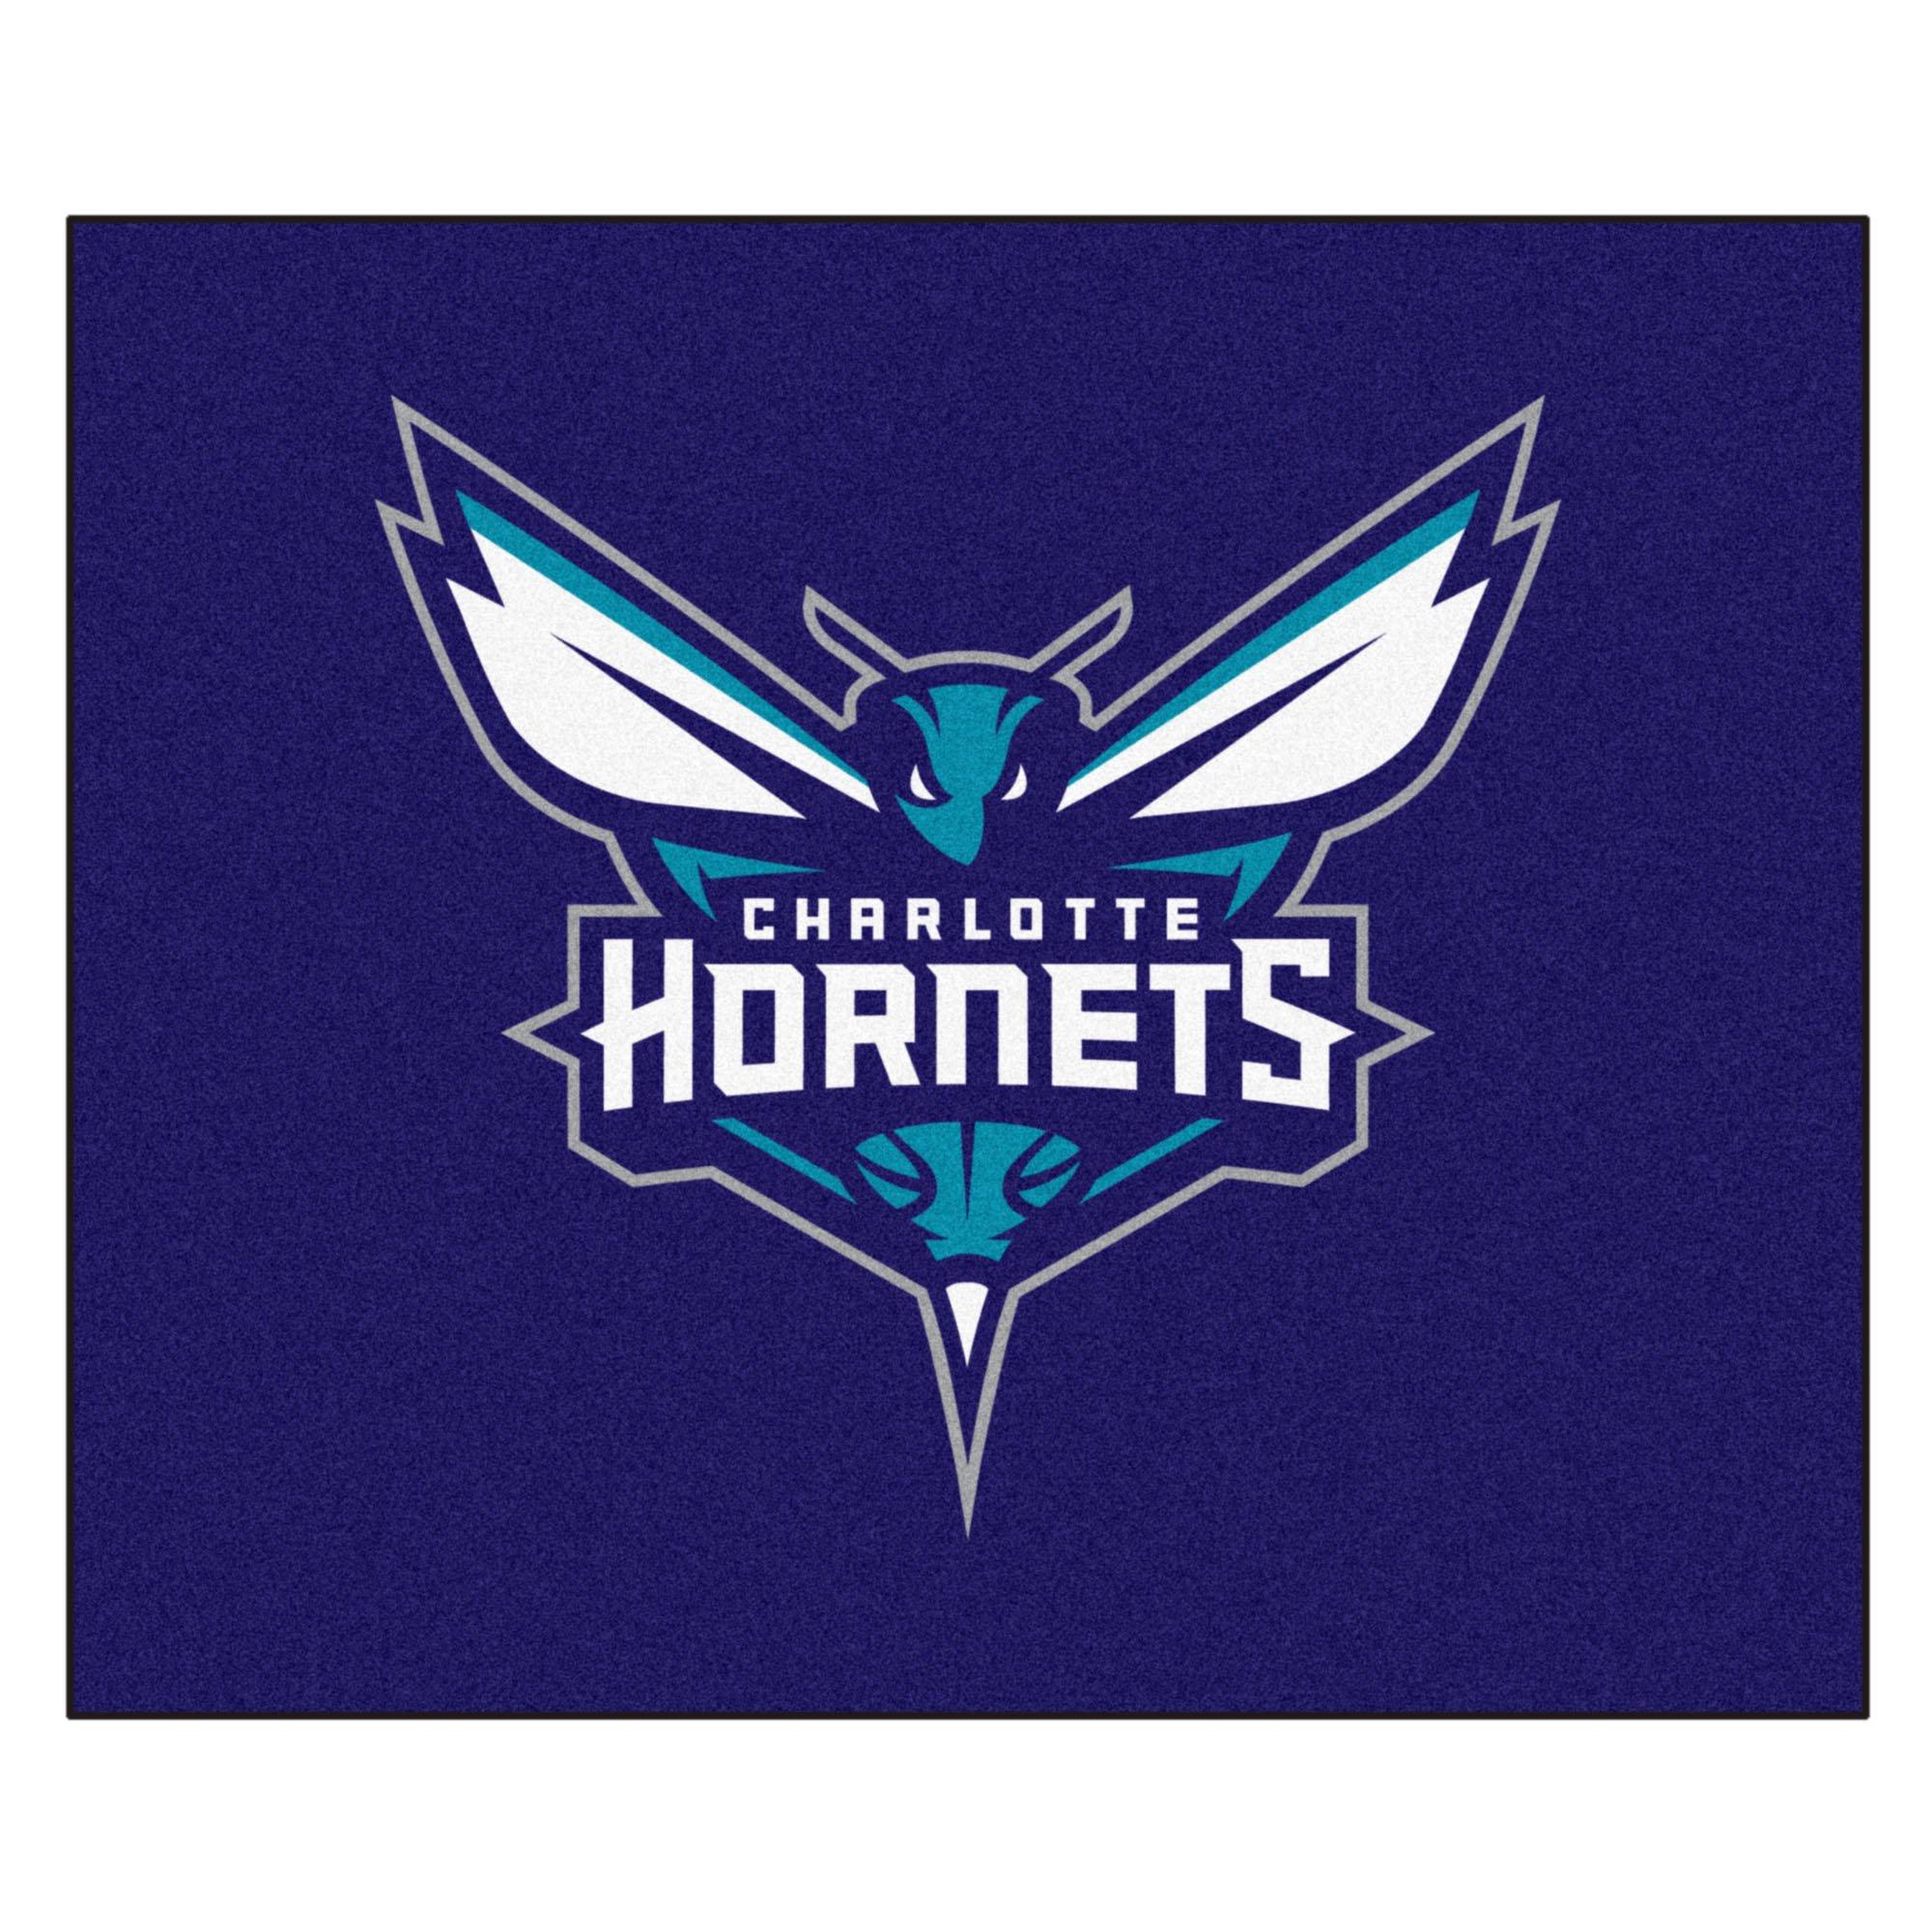 FANMATS 19429 NBA - Charlotte Hornets Tailgater Rug , Team Color, 59.5''x71''